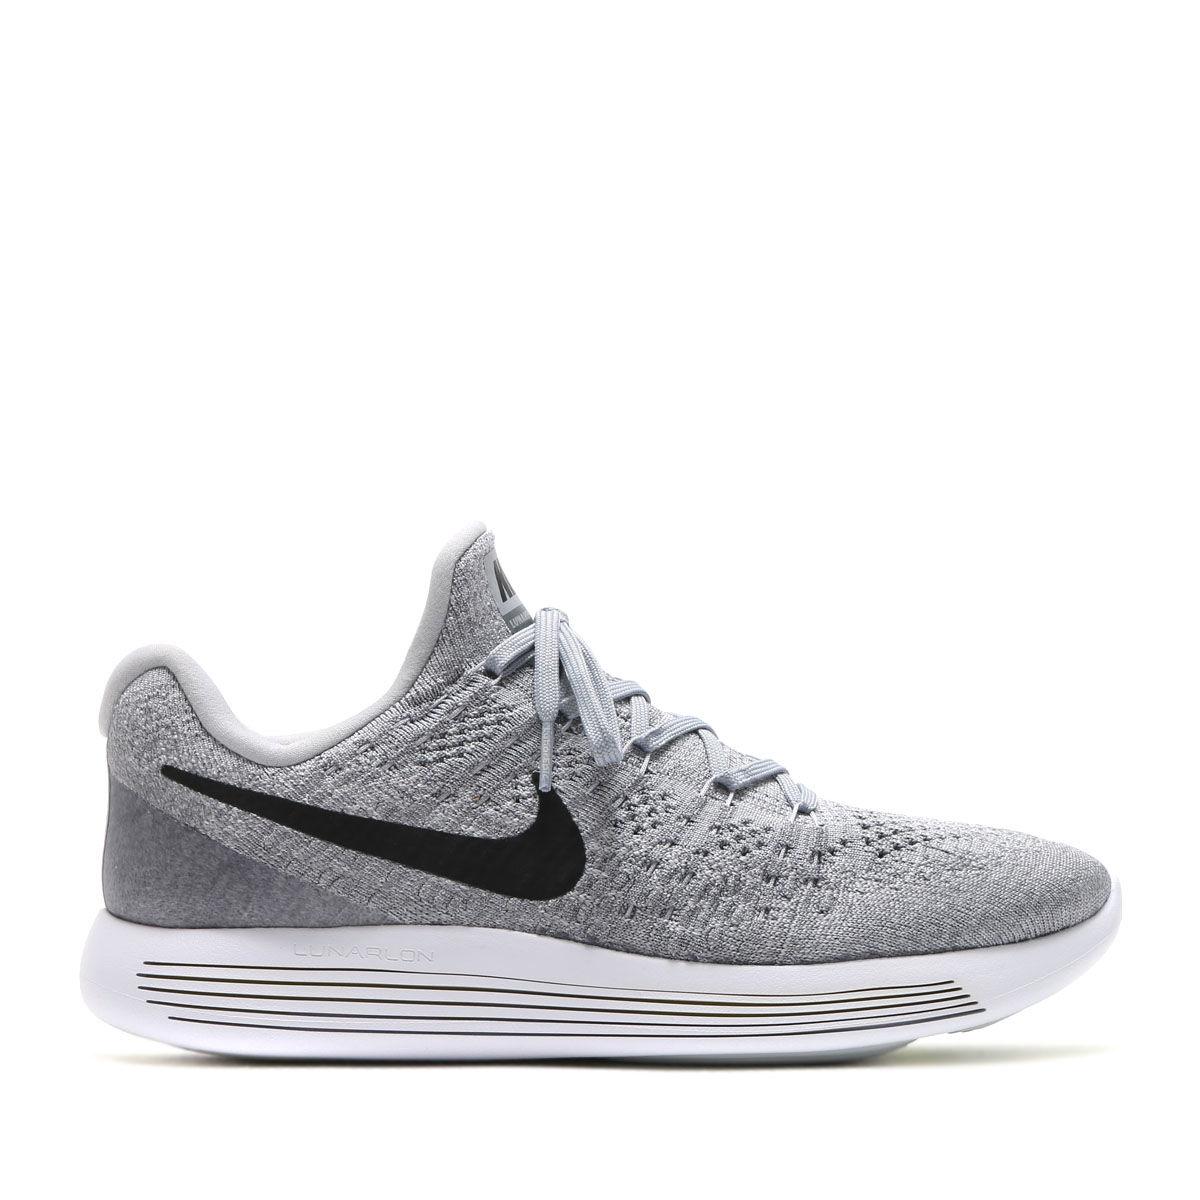 Nike LunarEpic low Flyknit 2 (Grau)